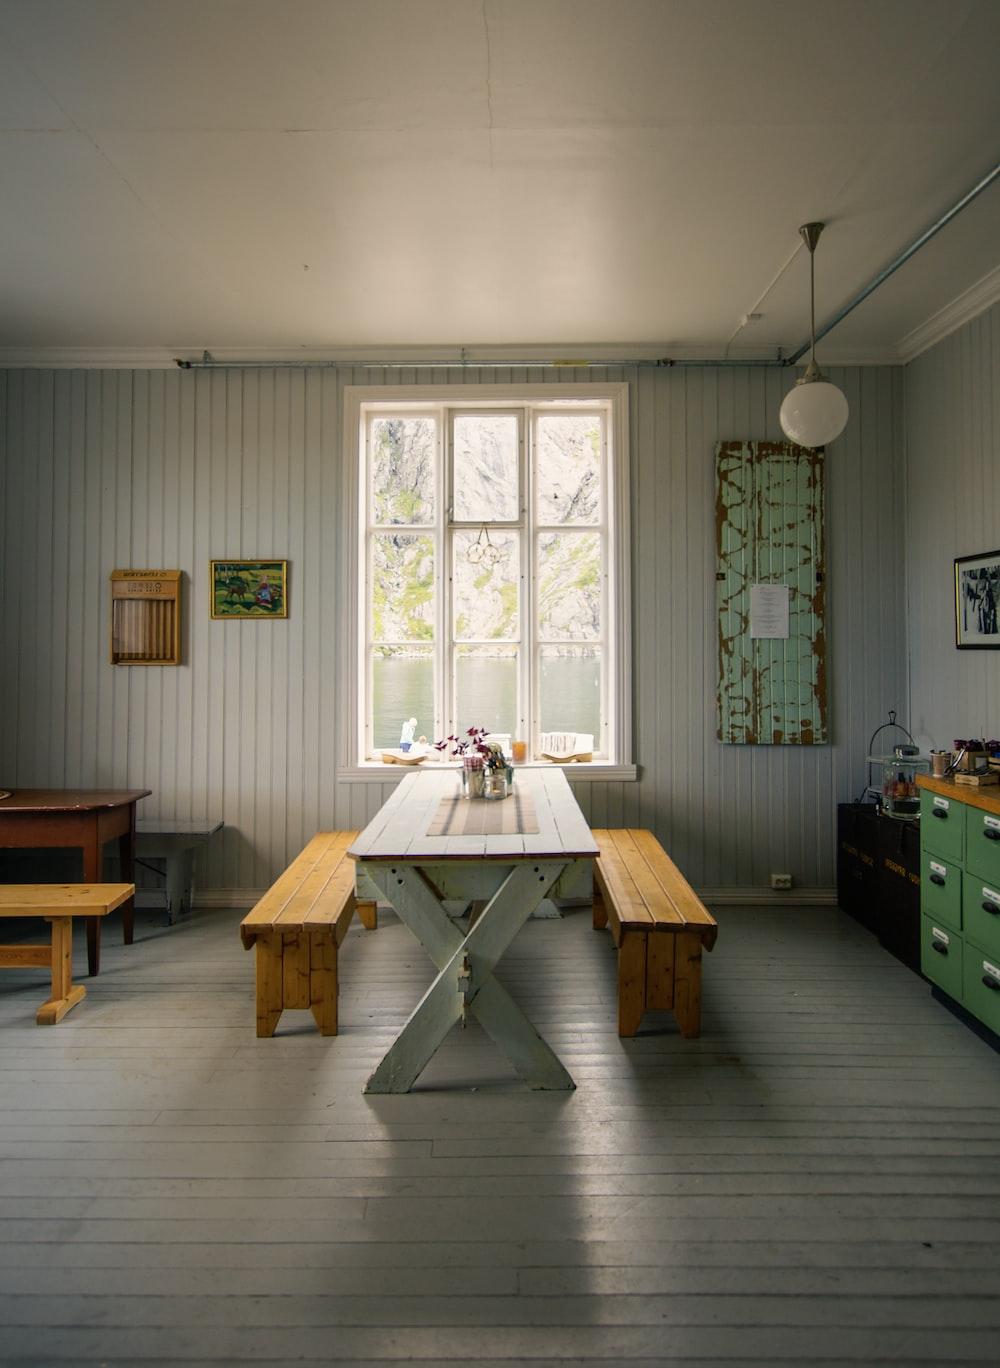 brown wooden table near window